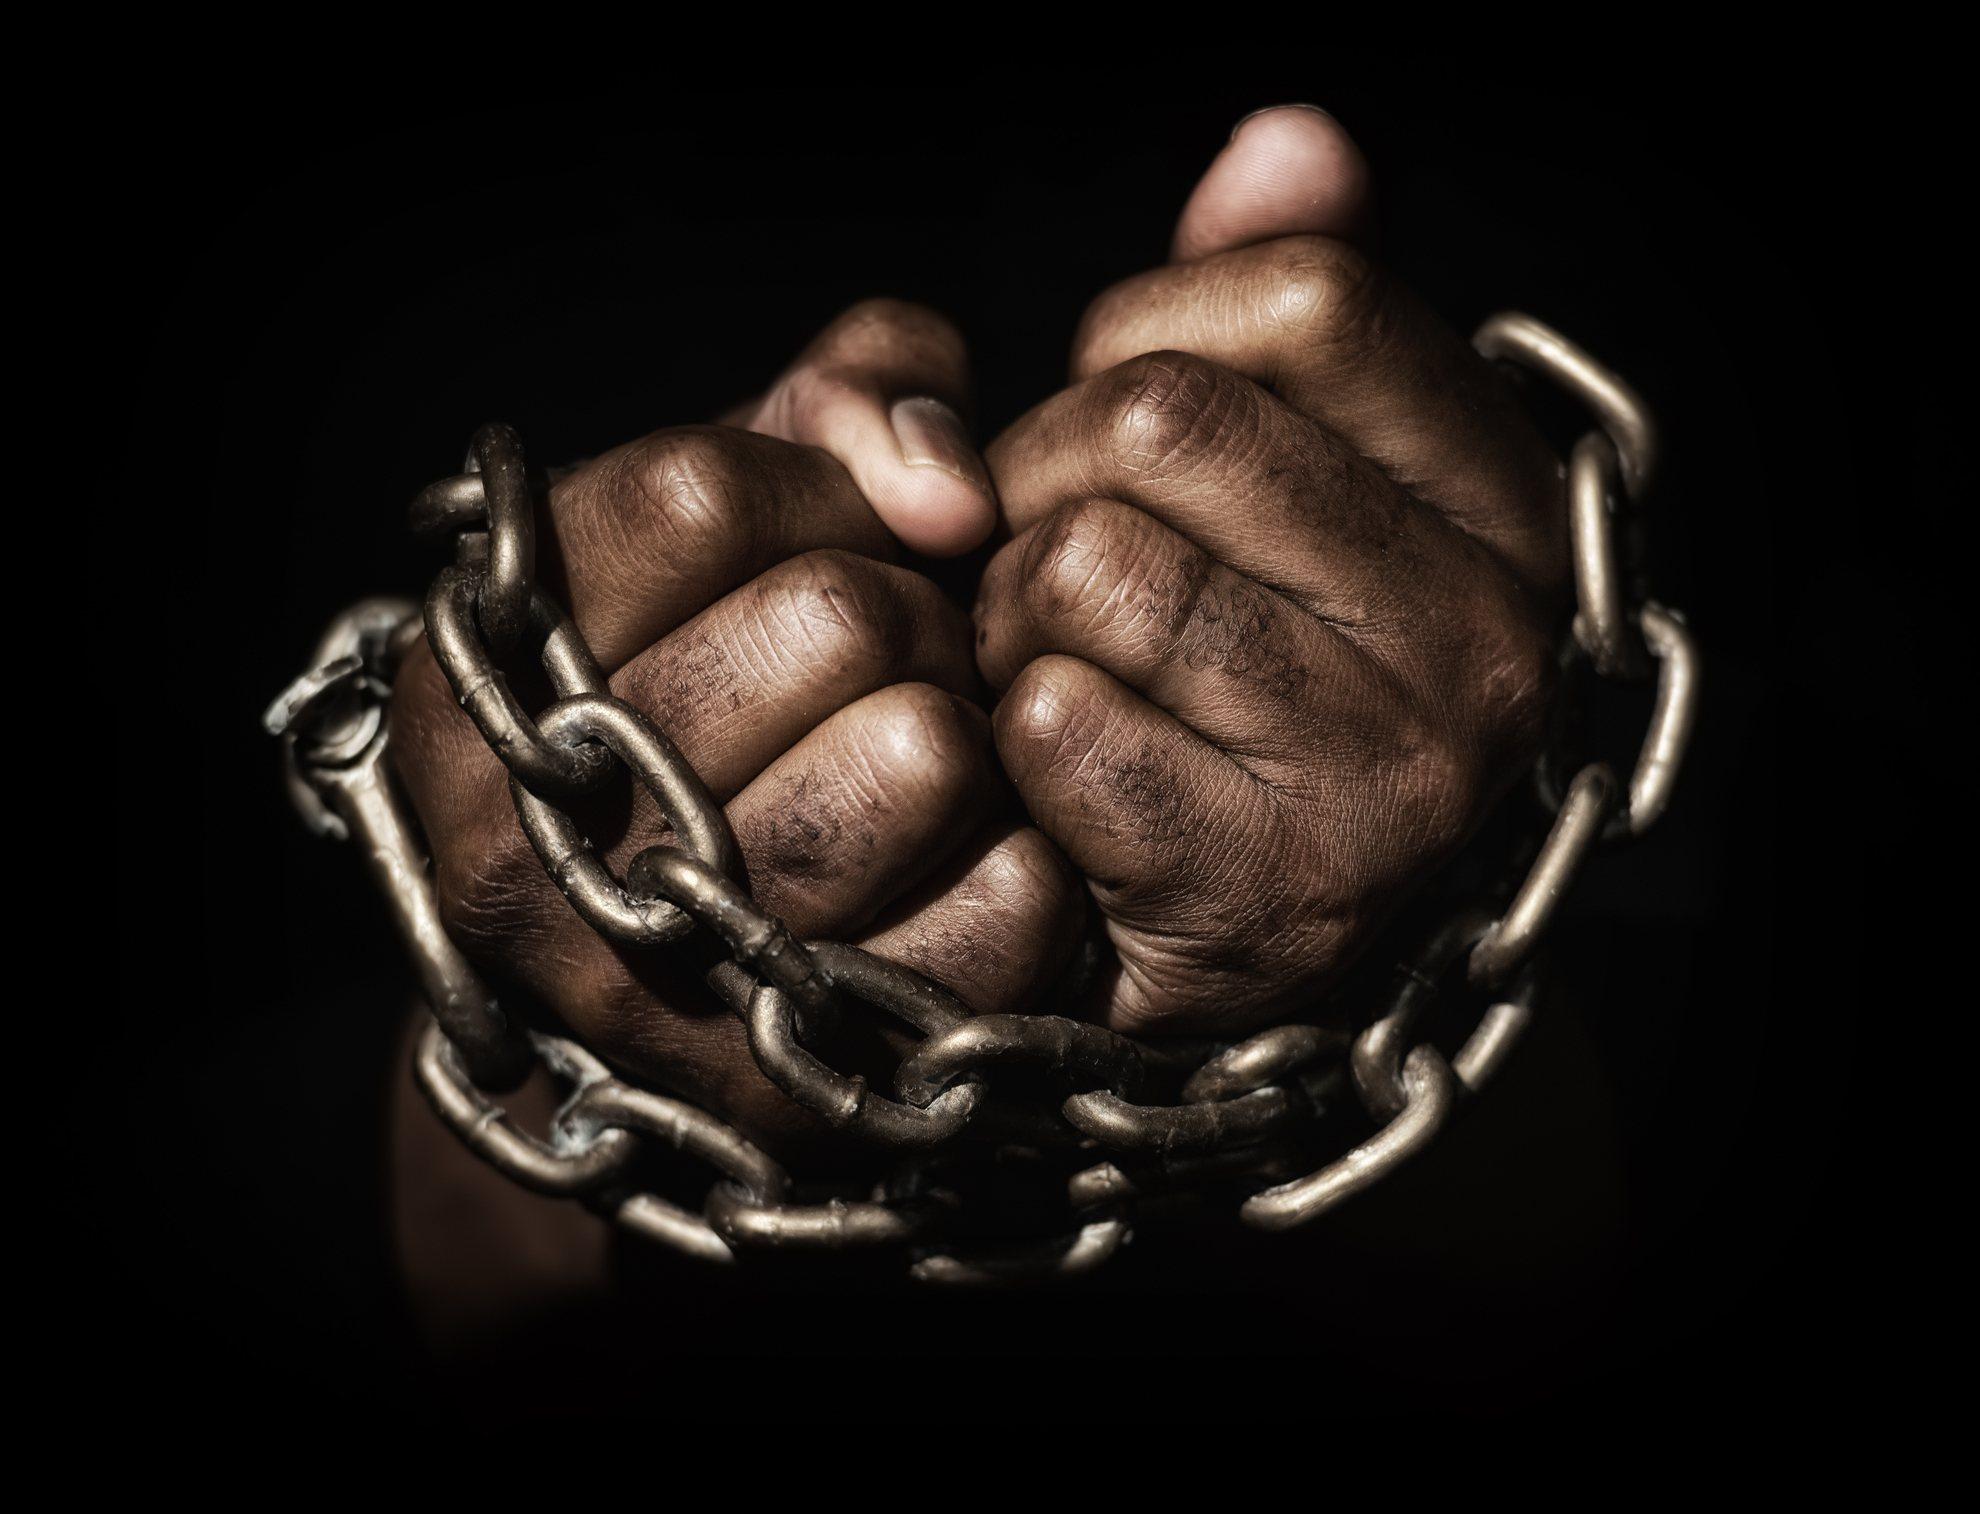 Enslaved person